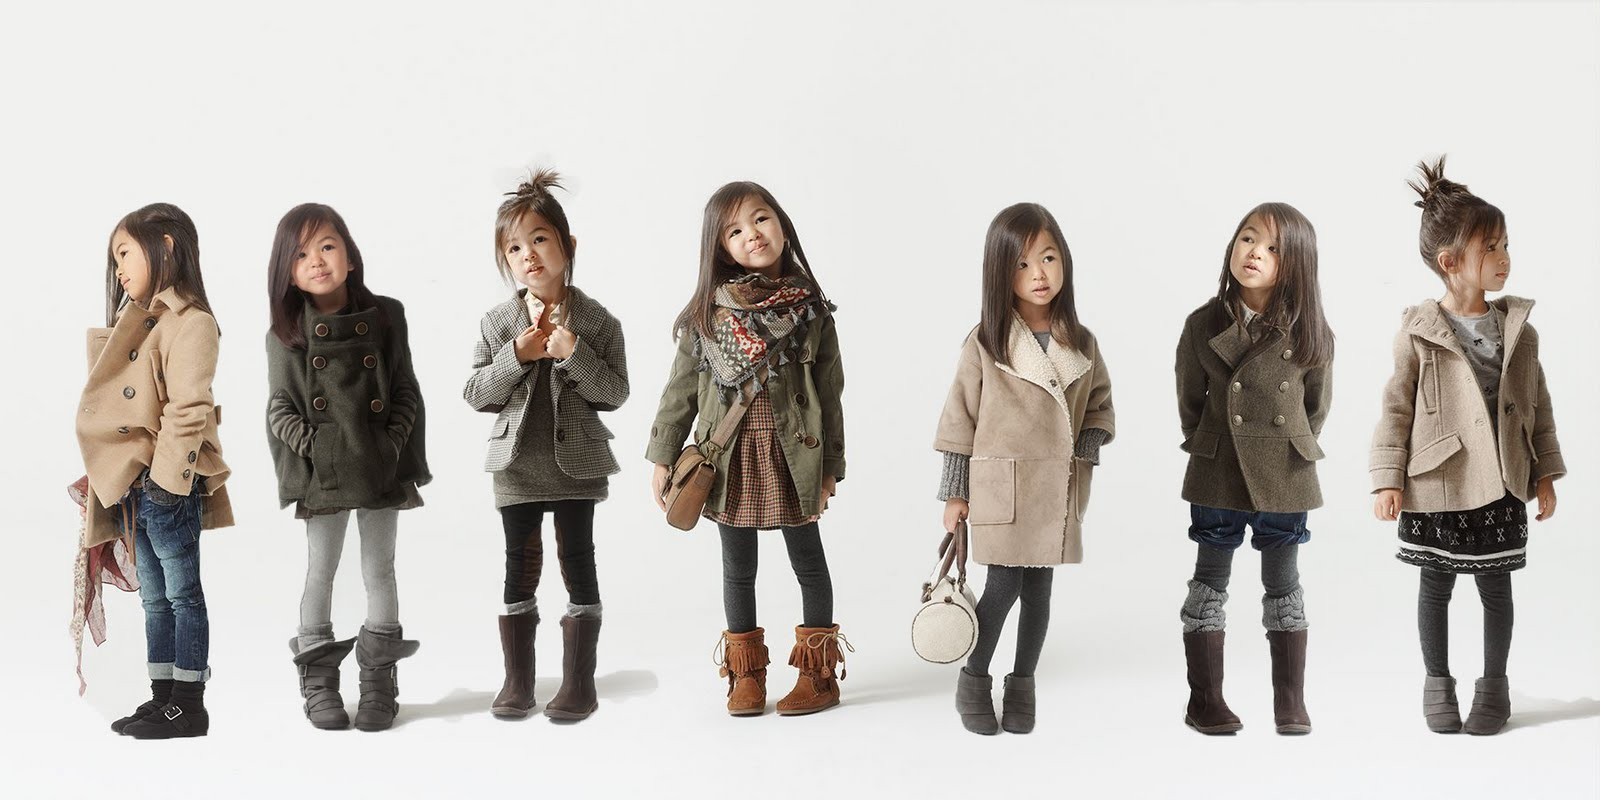 zara kids collection out in september geeks fashion. Black Bedroom Furniture Sets. Home Design Ideas